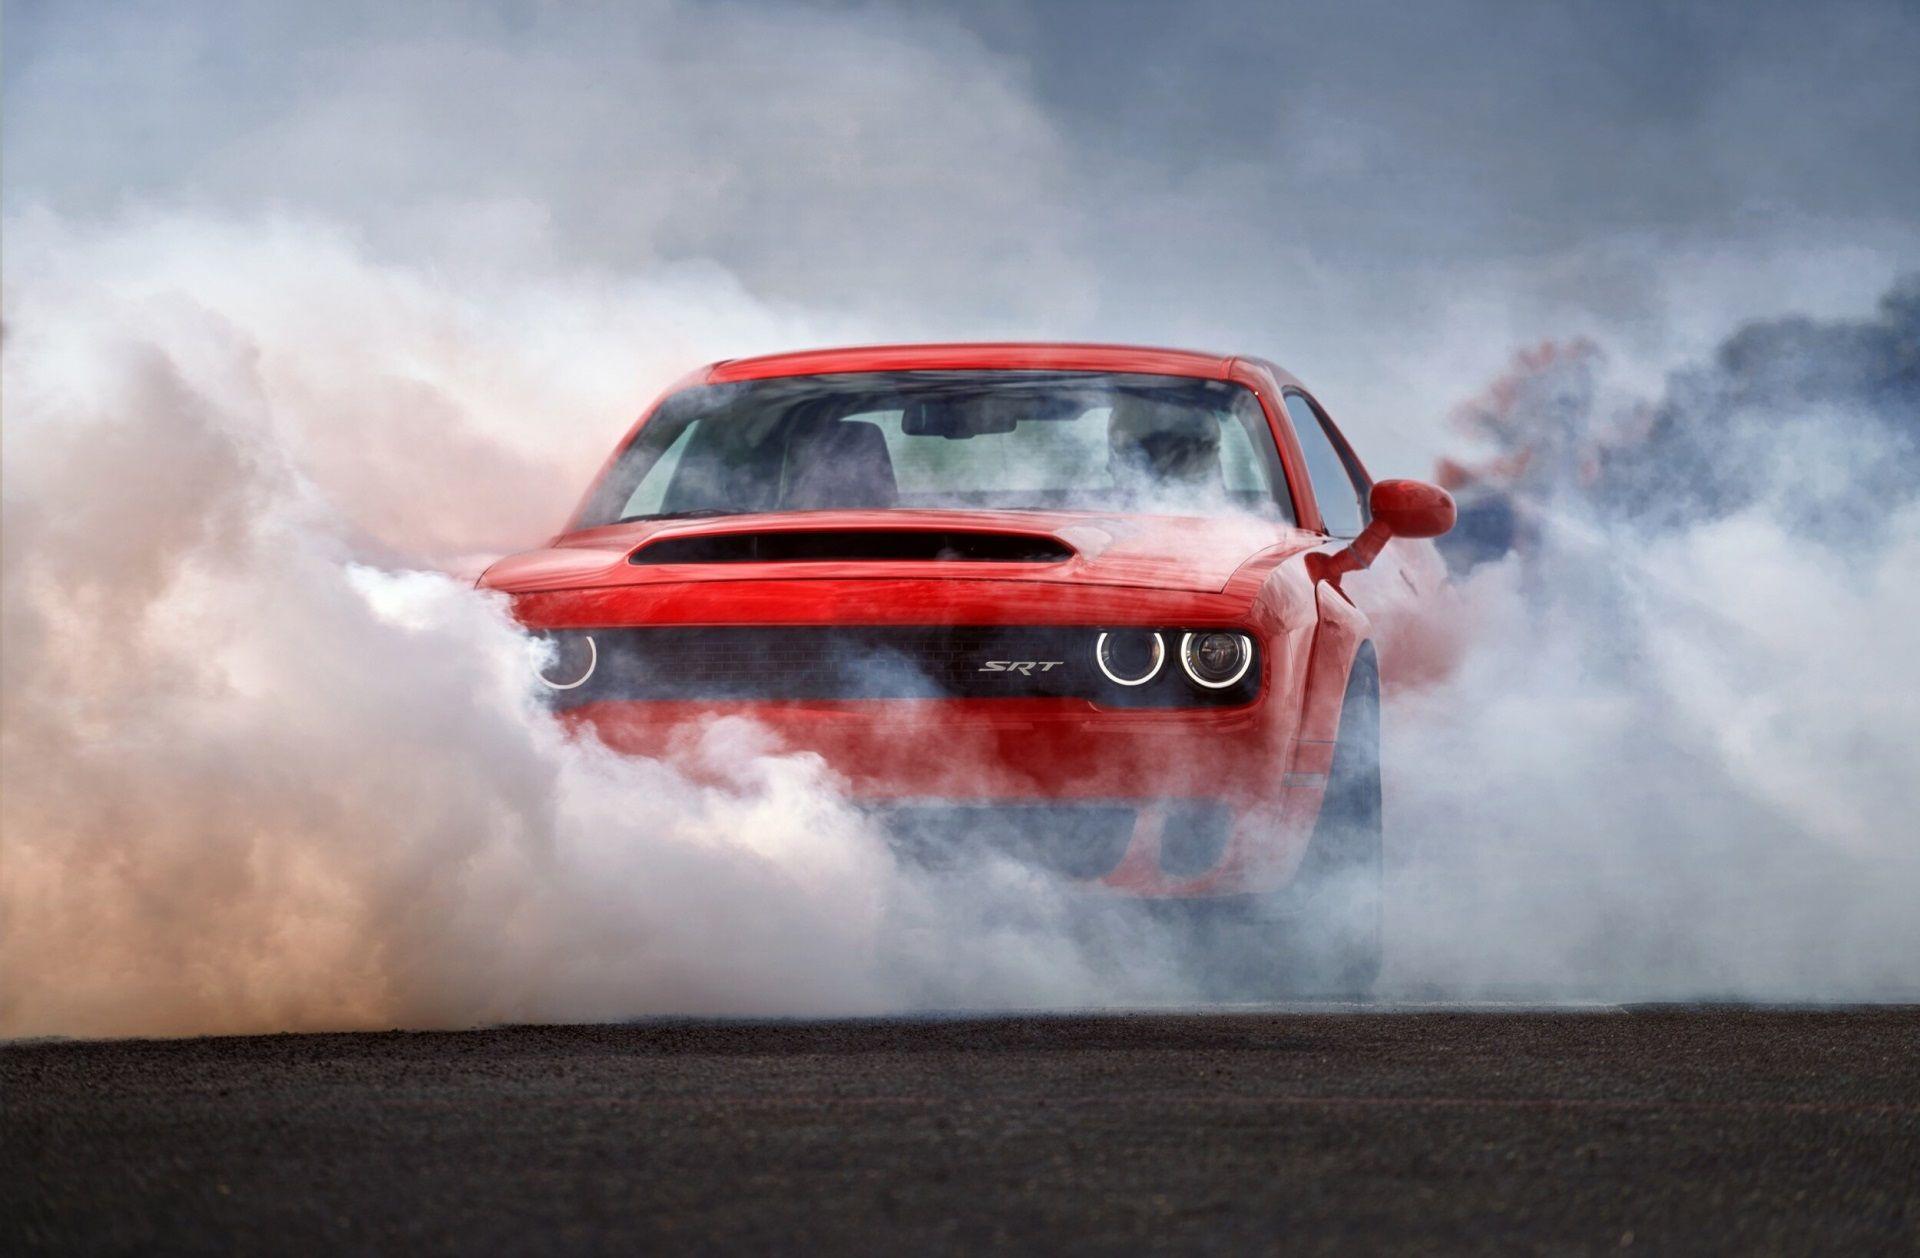 Dodge Demon Wallpaper 4k , HD Wallpaper & Backgrounds